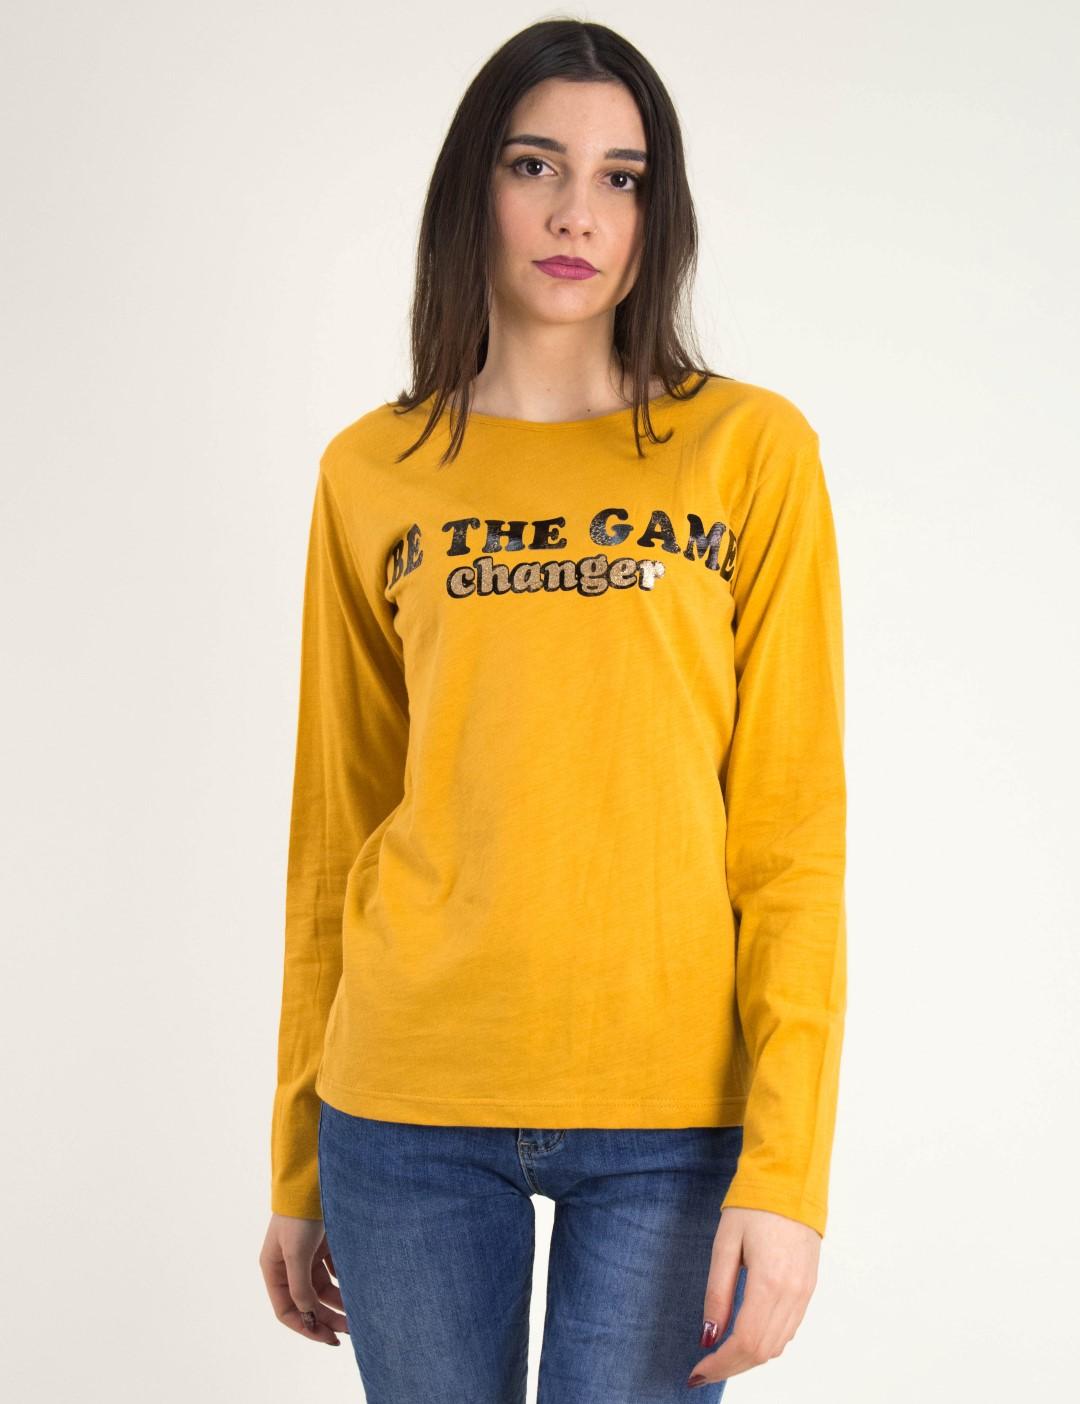 ea20033a8dd7 Γυναικεία ώχρα μακρυμάνικη μπλούζα τύπωμα 1175954L